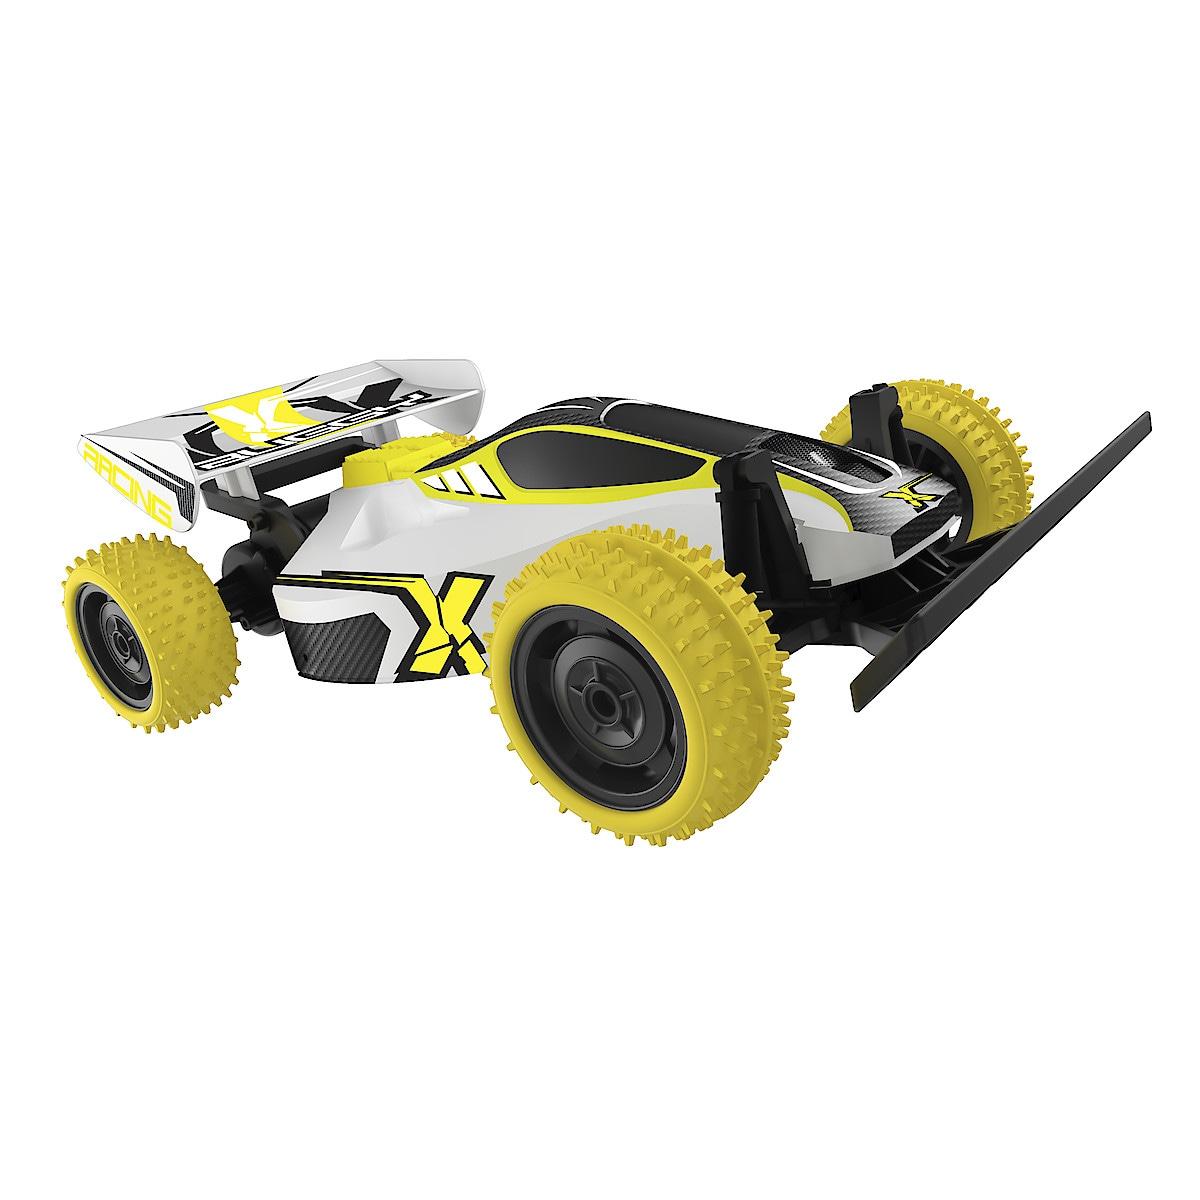 Radiostyrd bil, Exost Buggy Racing by Silverlit